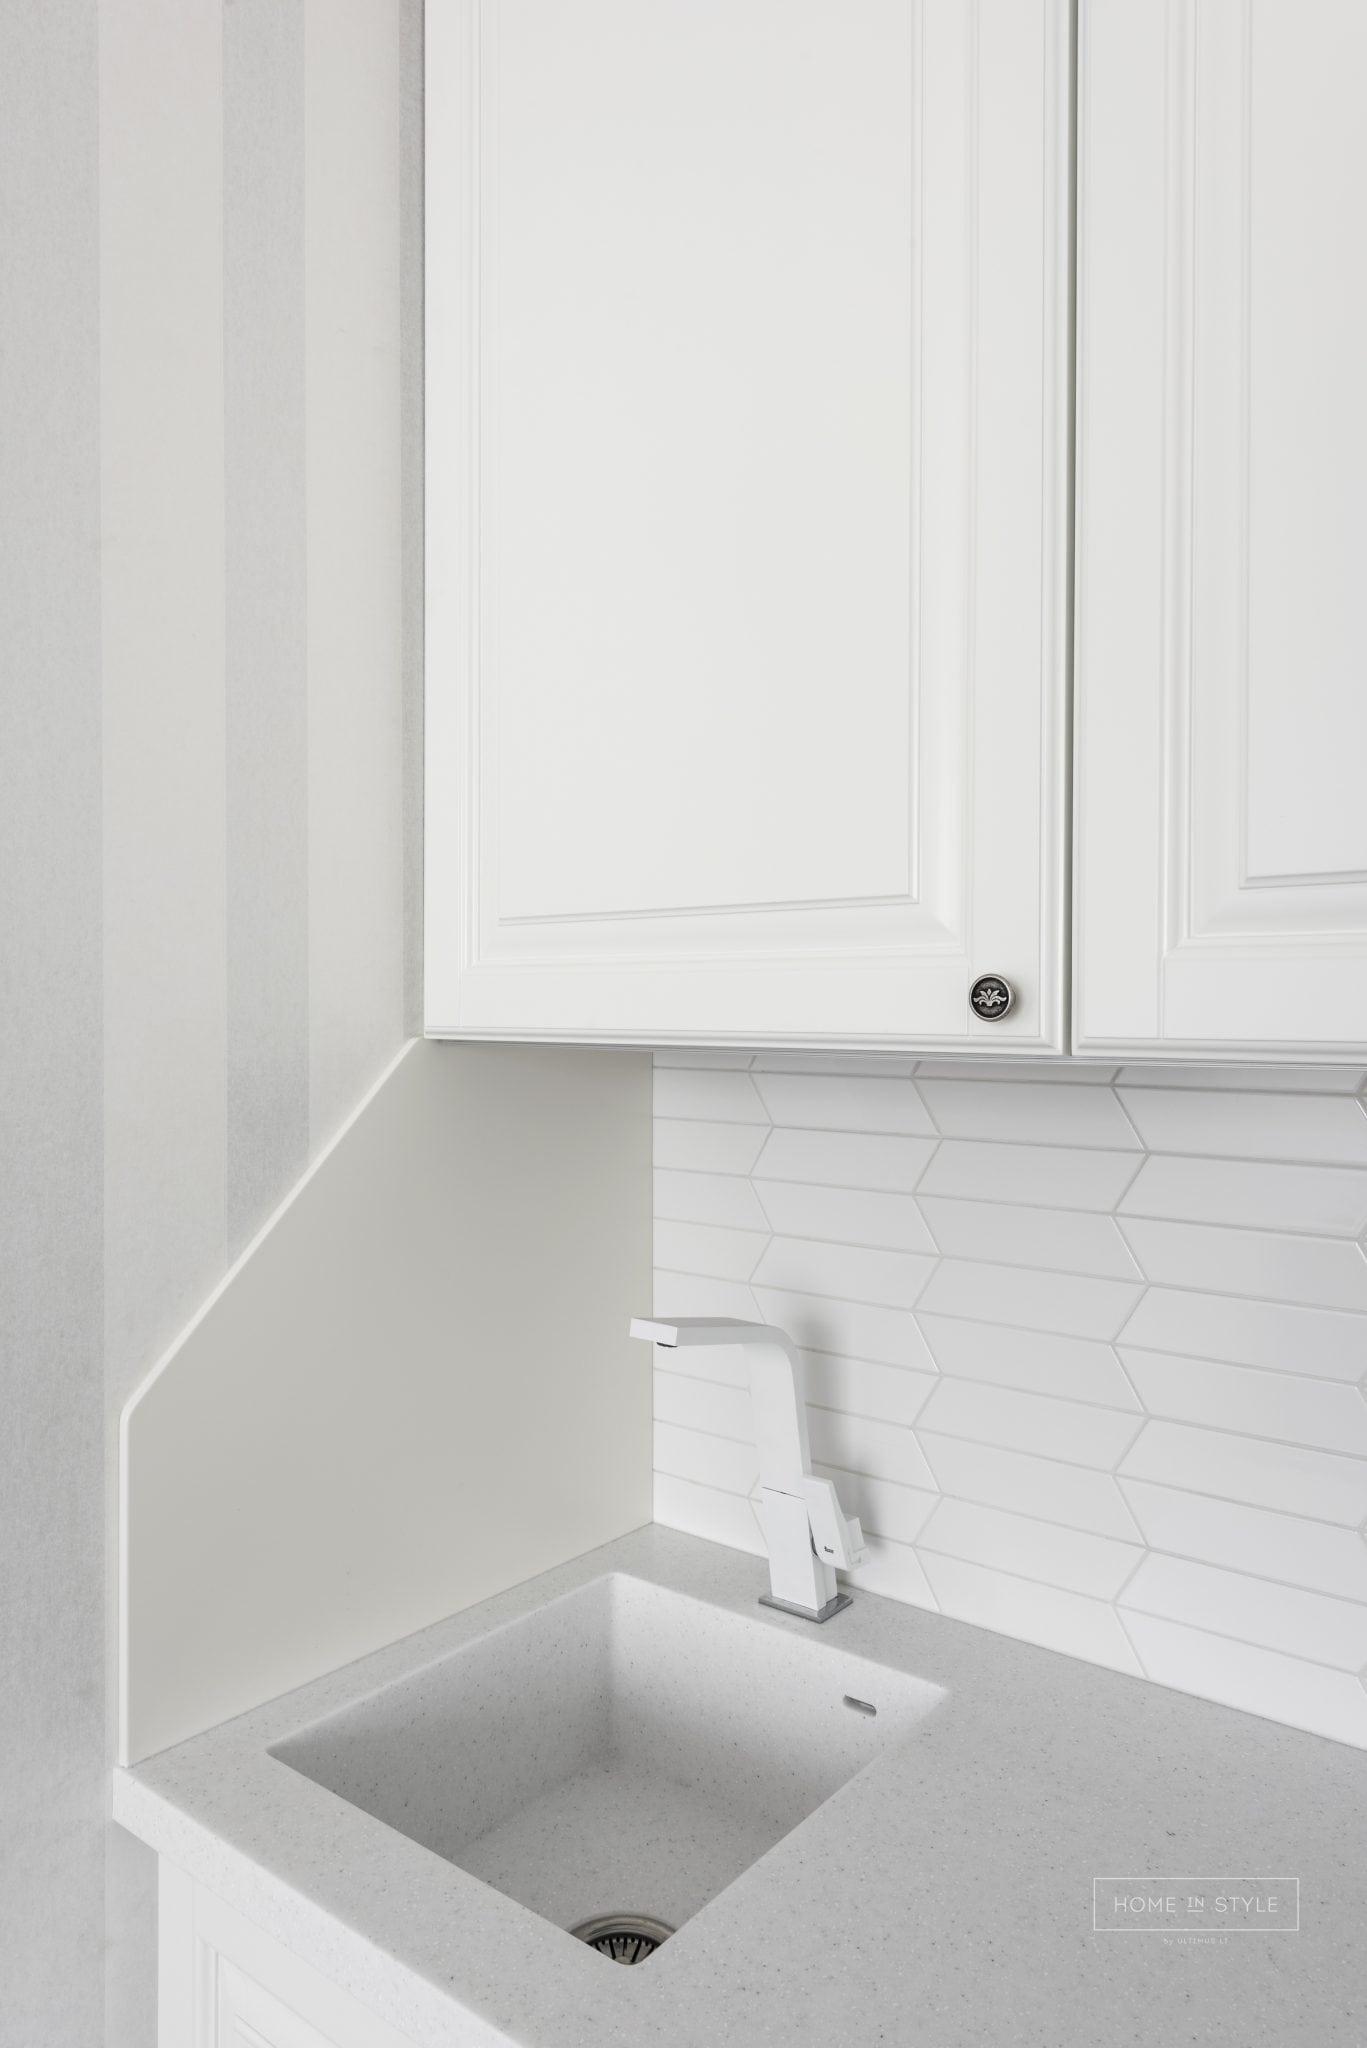 Klasikinis interjeras virtuves baldu gamyba projektas